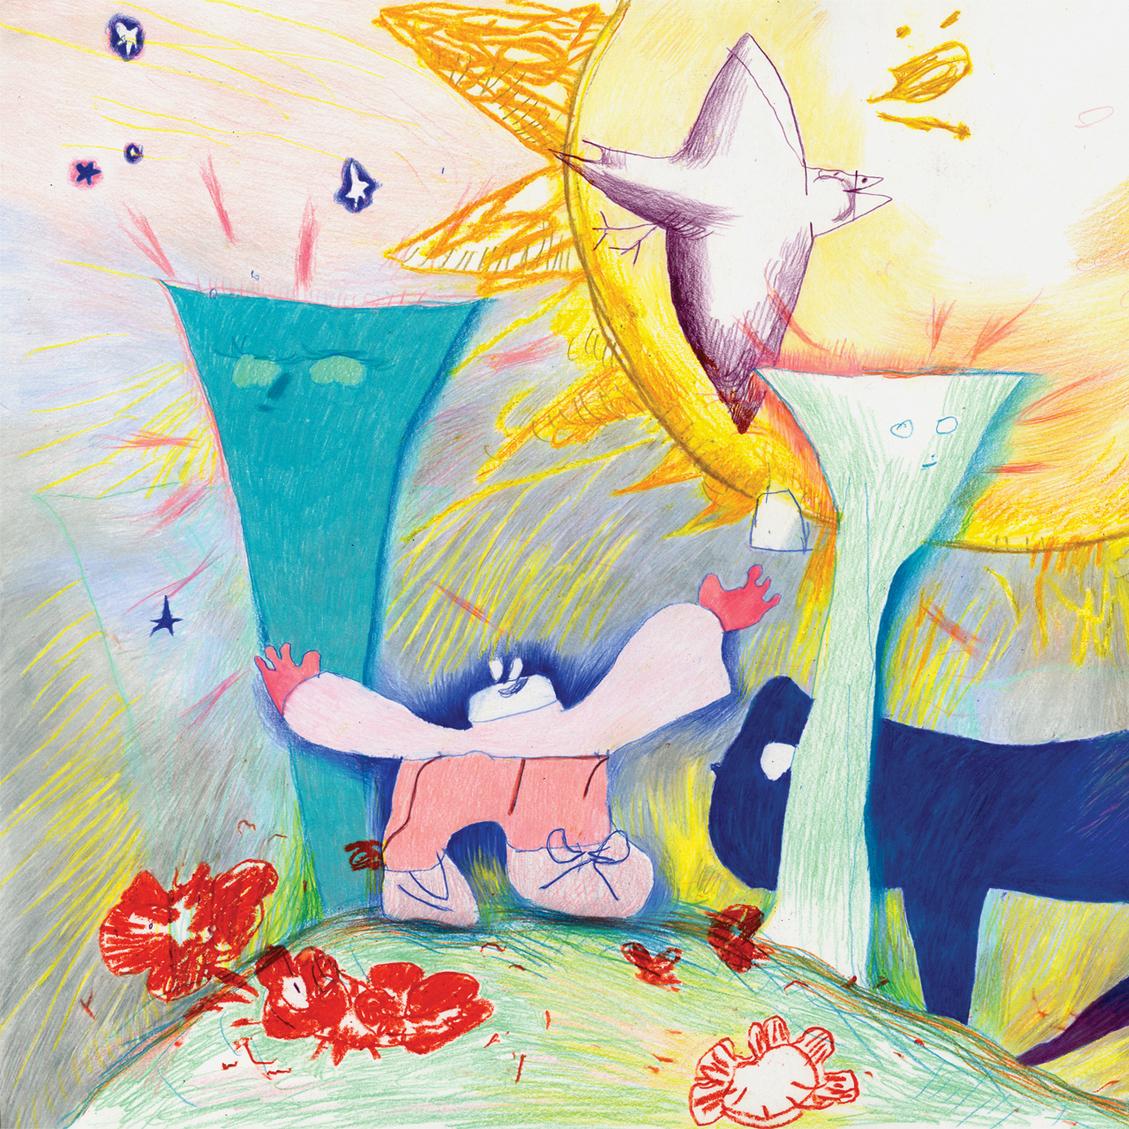 Cassie Zhang - Website insta: @assiezhangFeature: Paper Earth Vol.1California